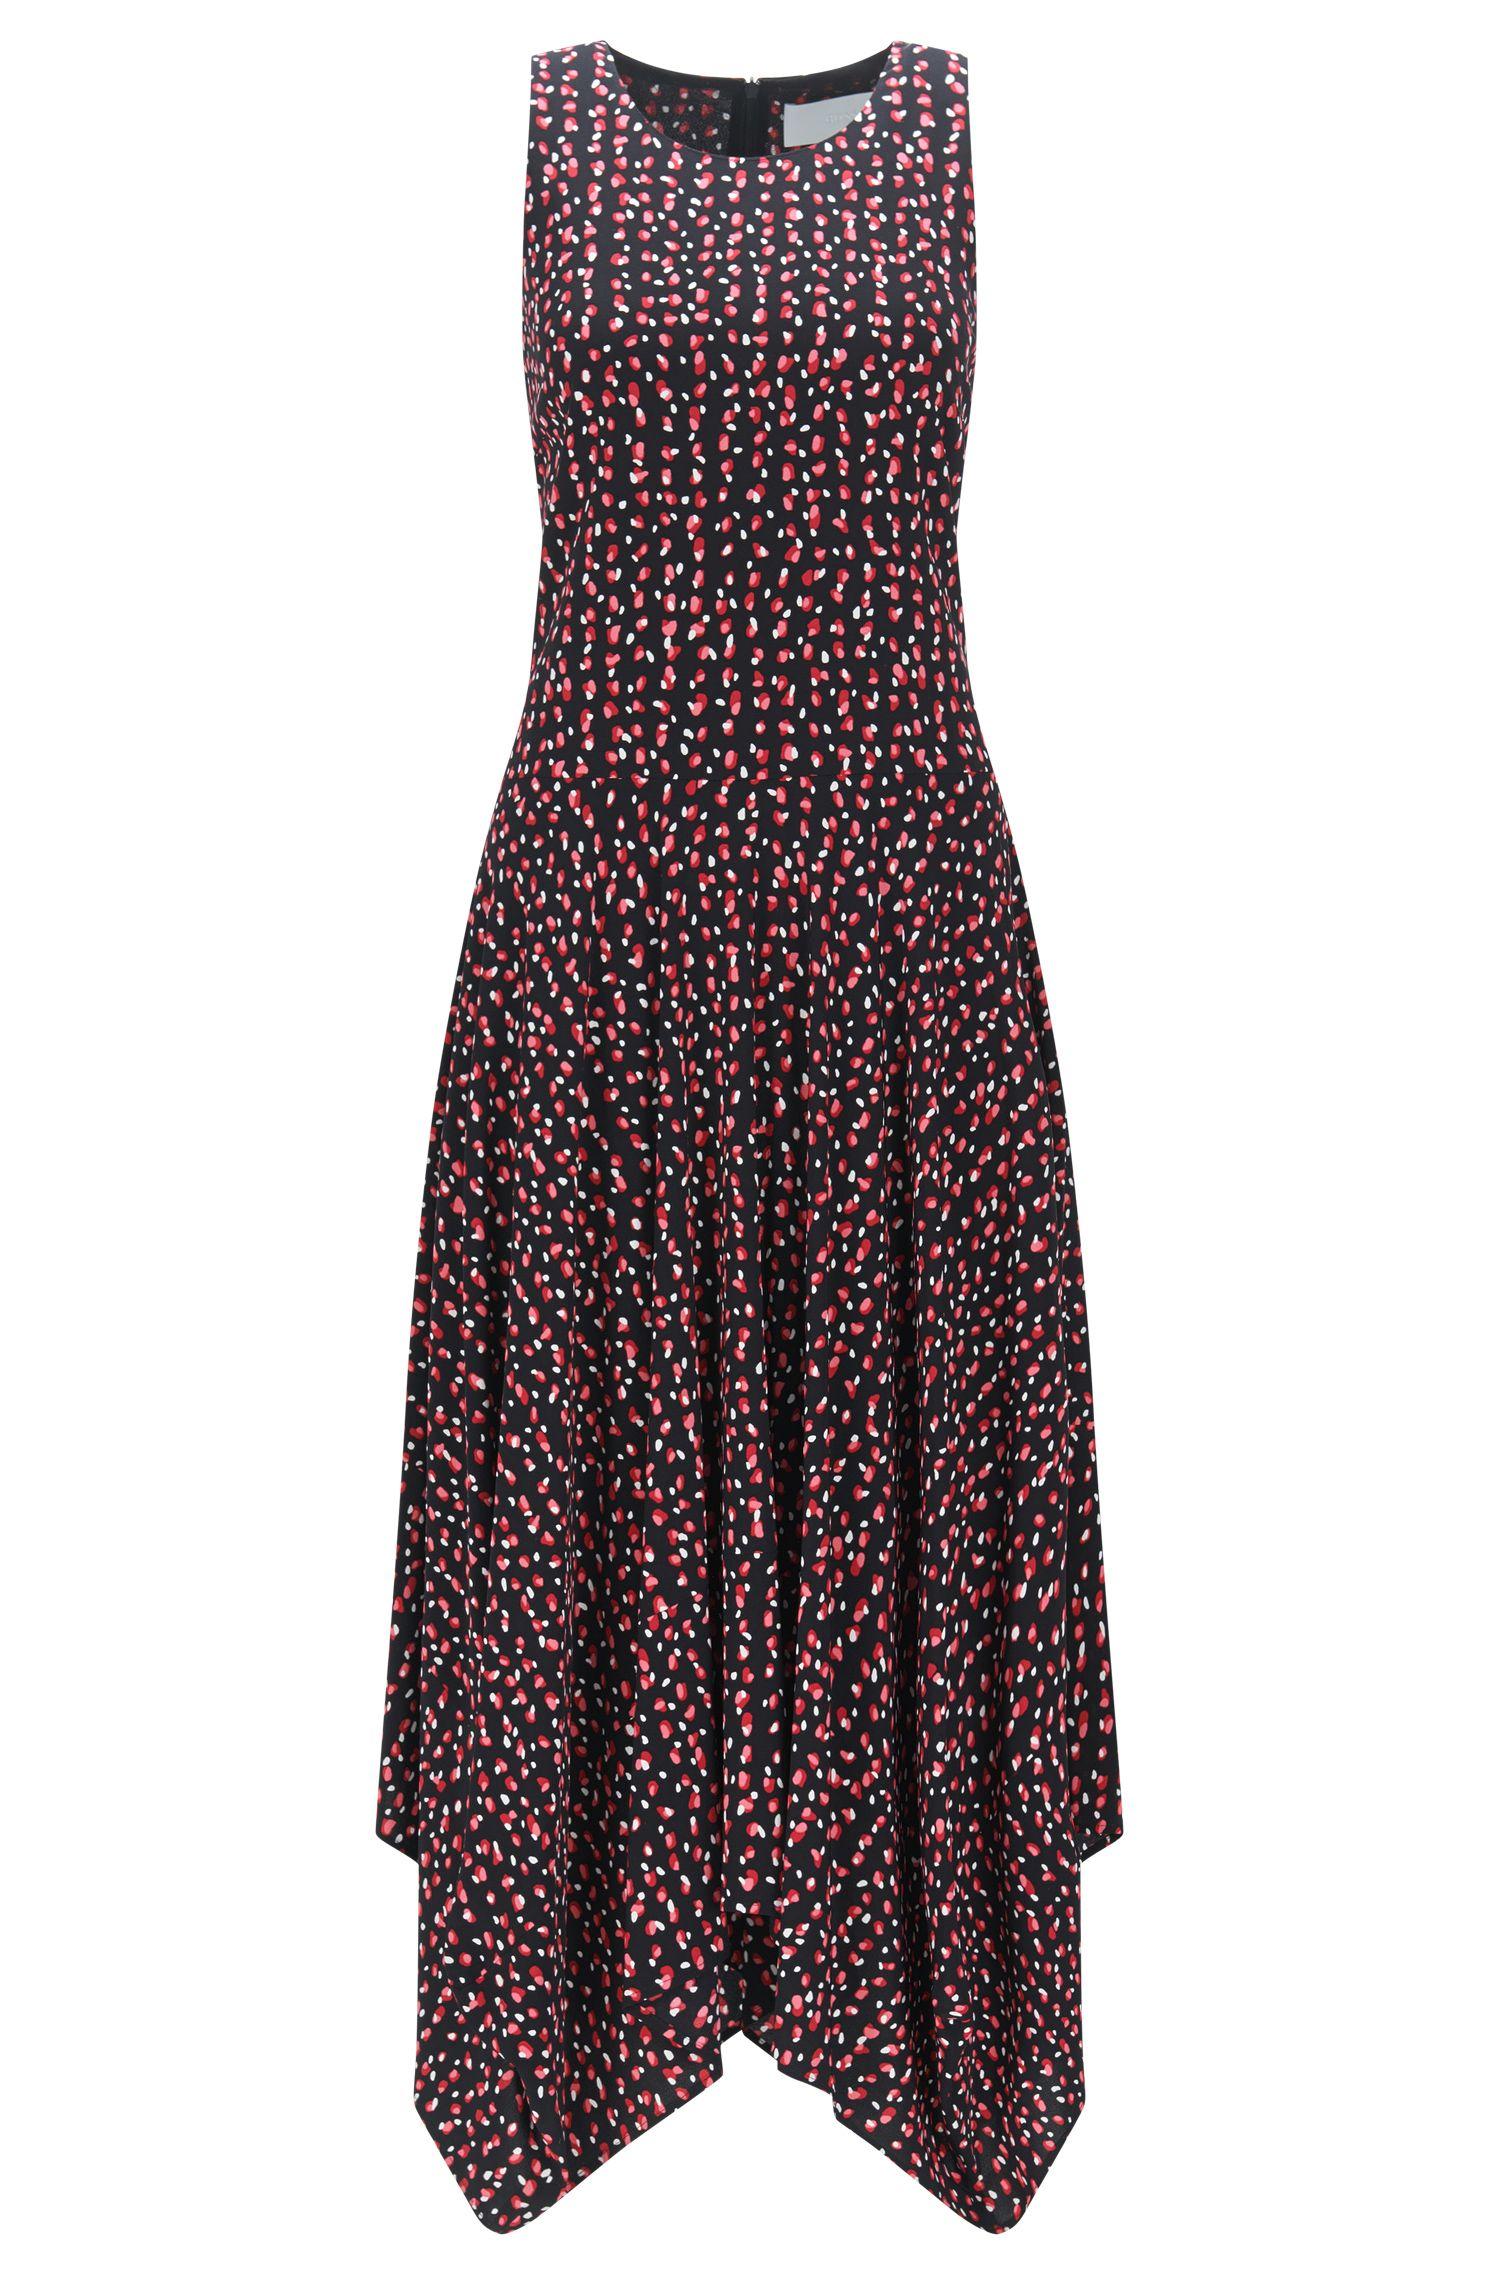 Relaxed-Fit Kleid aus softem Crêpe-Gewebe mit Print